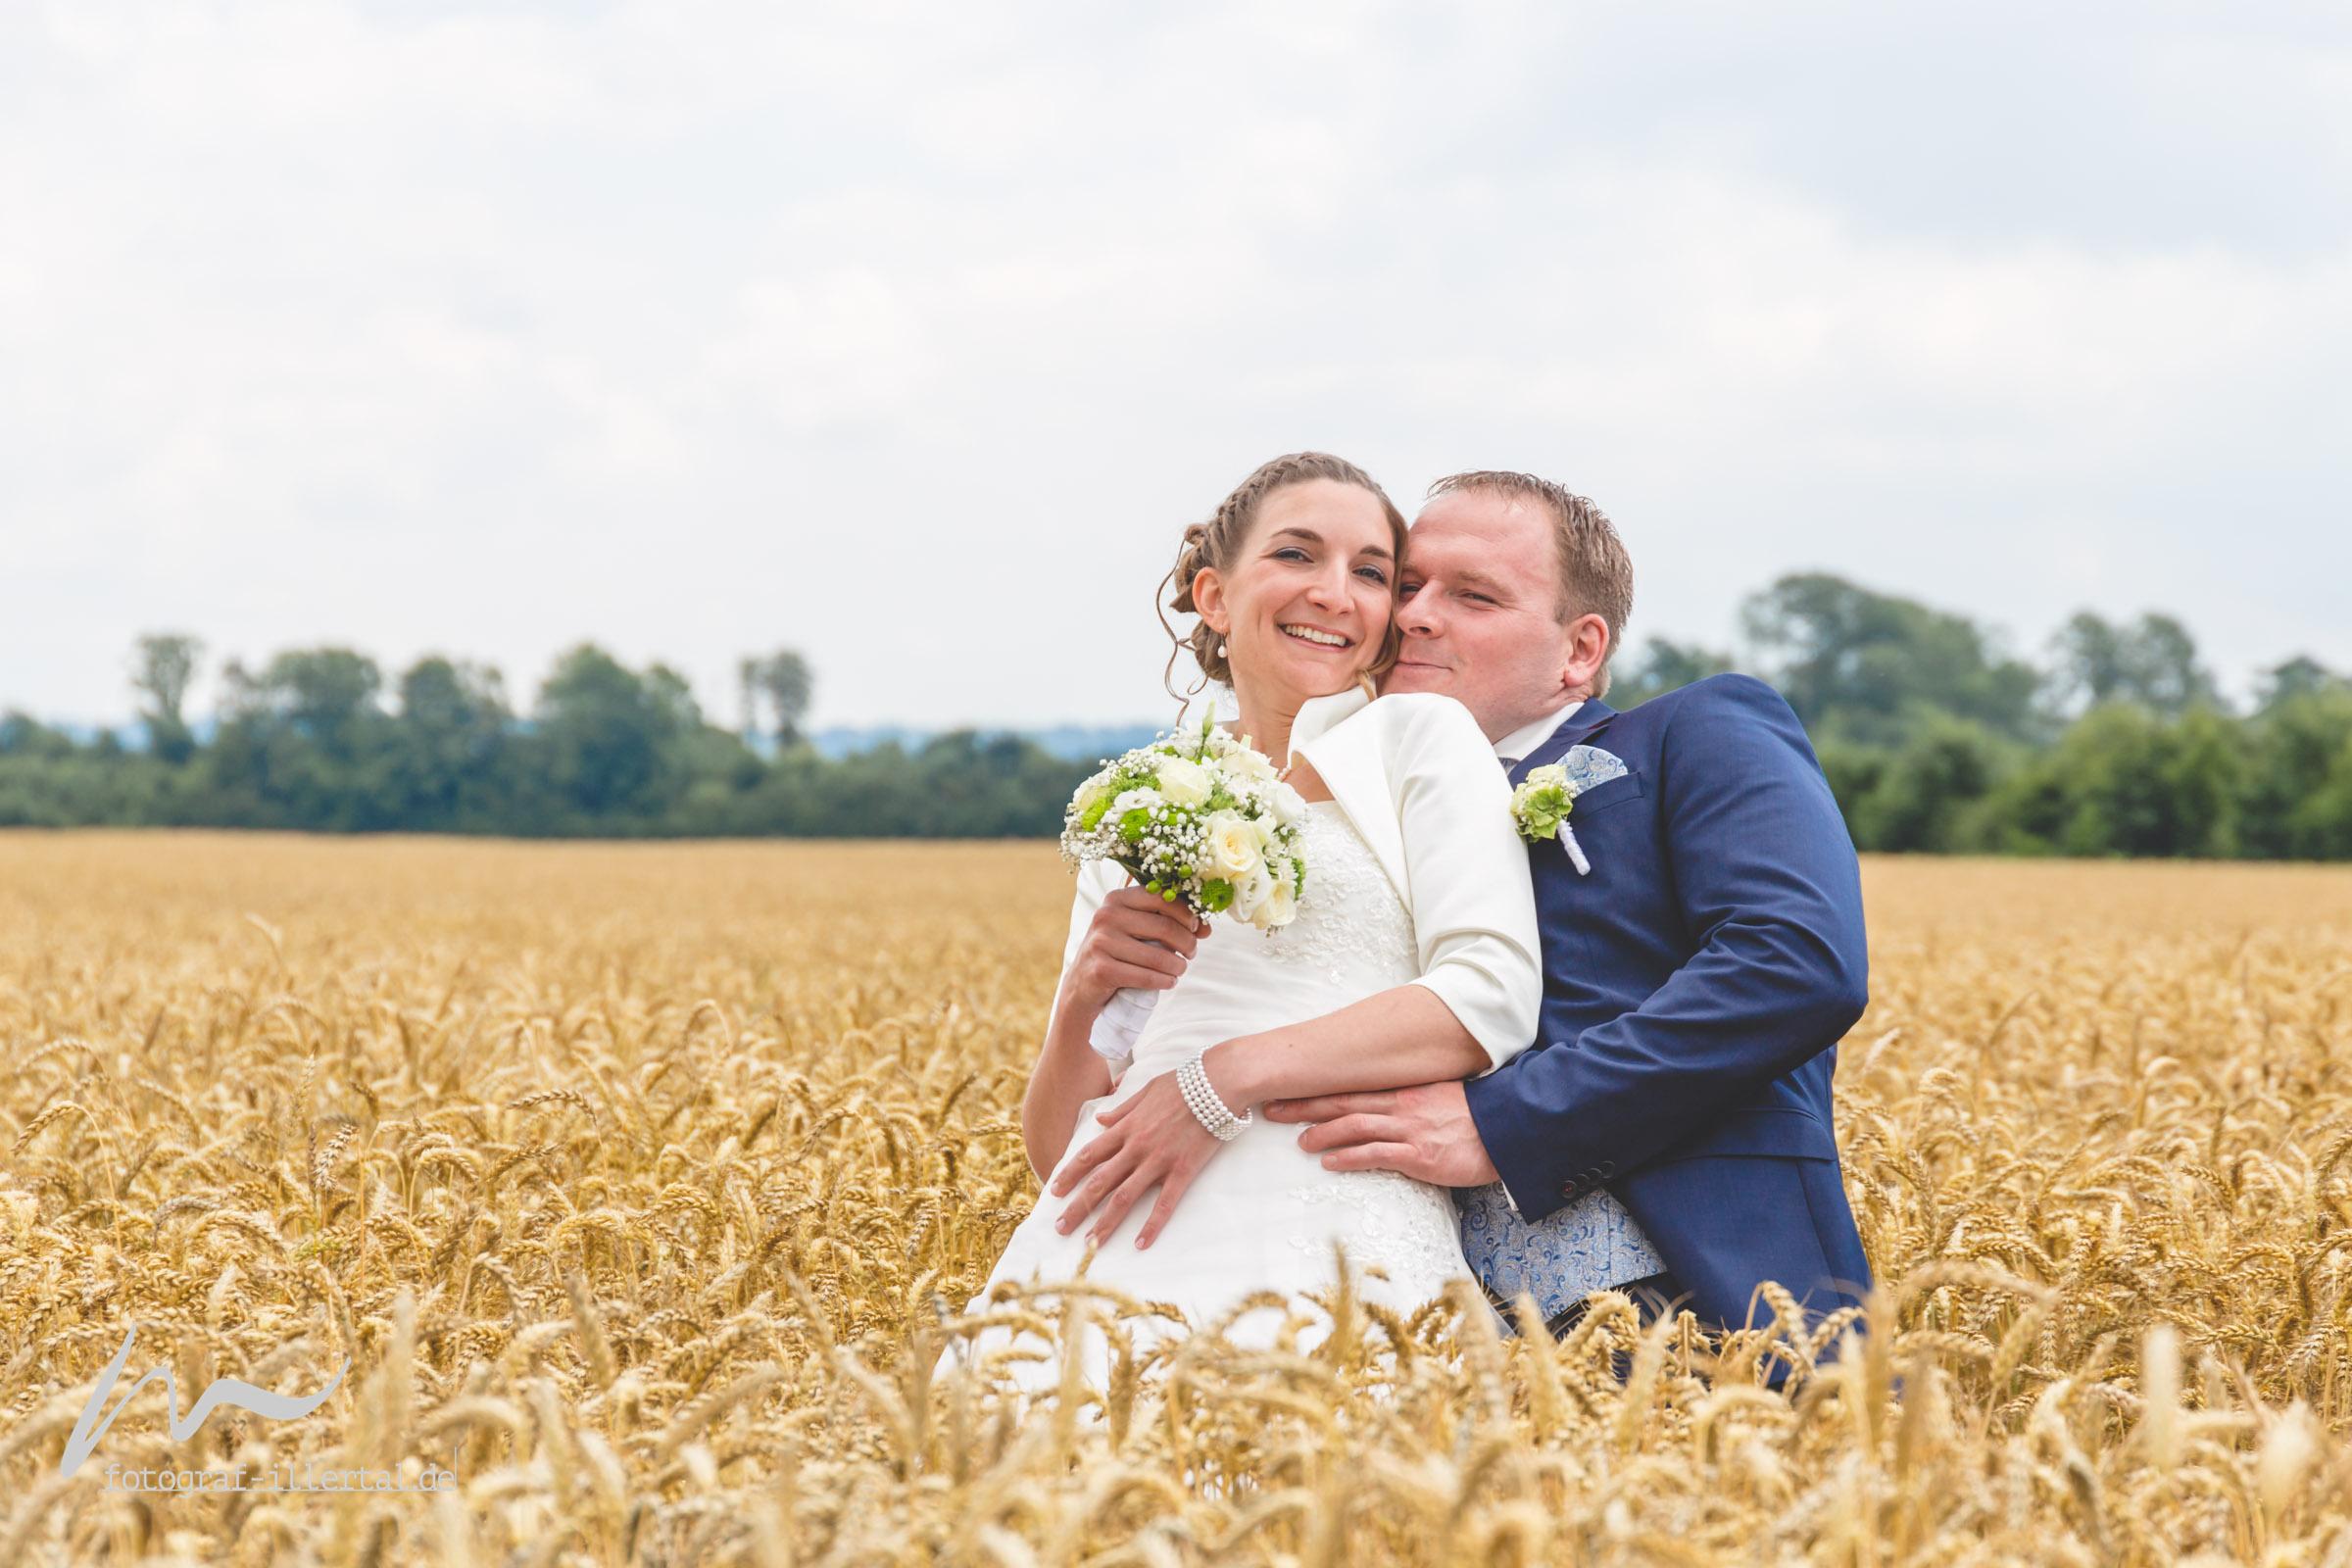 Fotograf Illertal-Christian Miller-Hochzeitsfotografie-_MG_3023